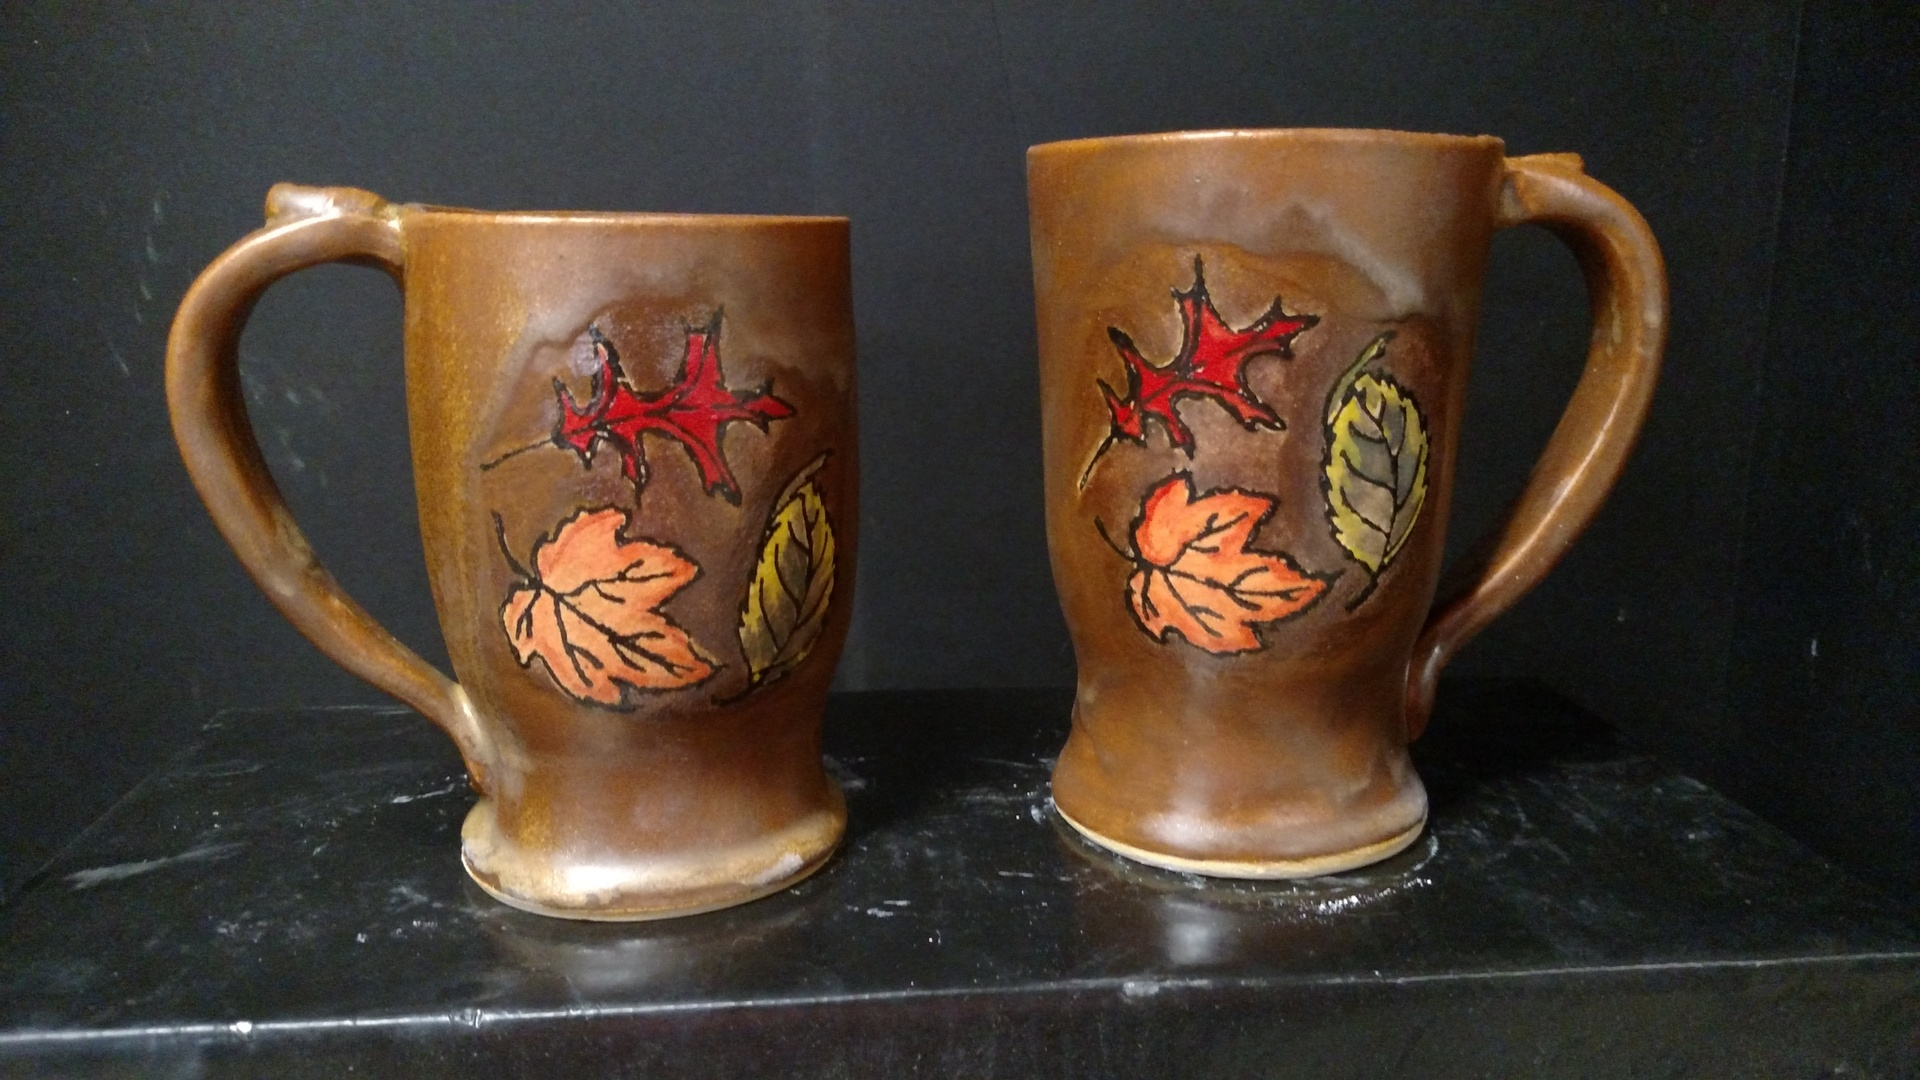 Stoneware mugs - hand drawn leaves